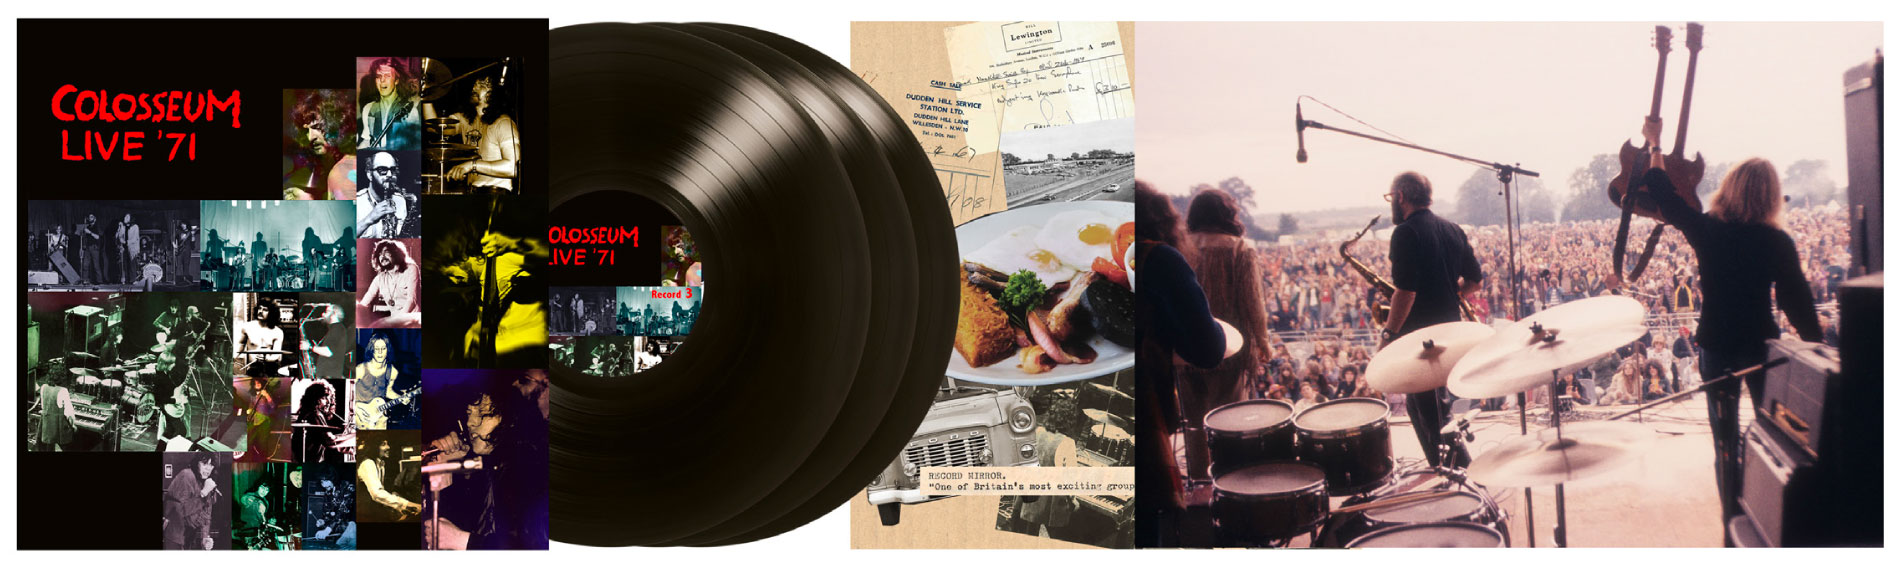 Live '71 Canterbury, Brighton & Manchester